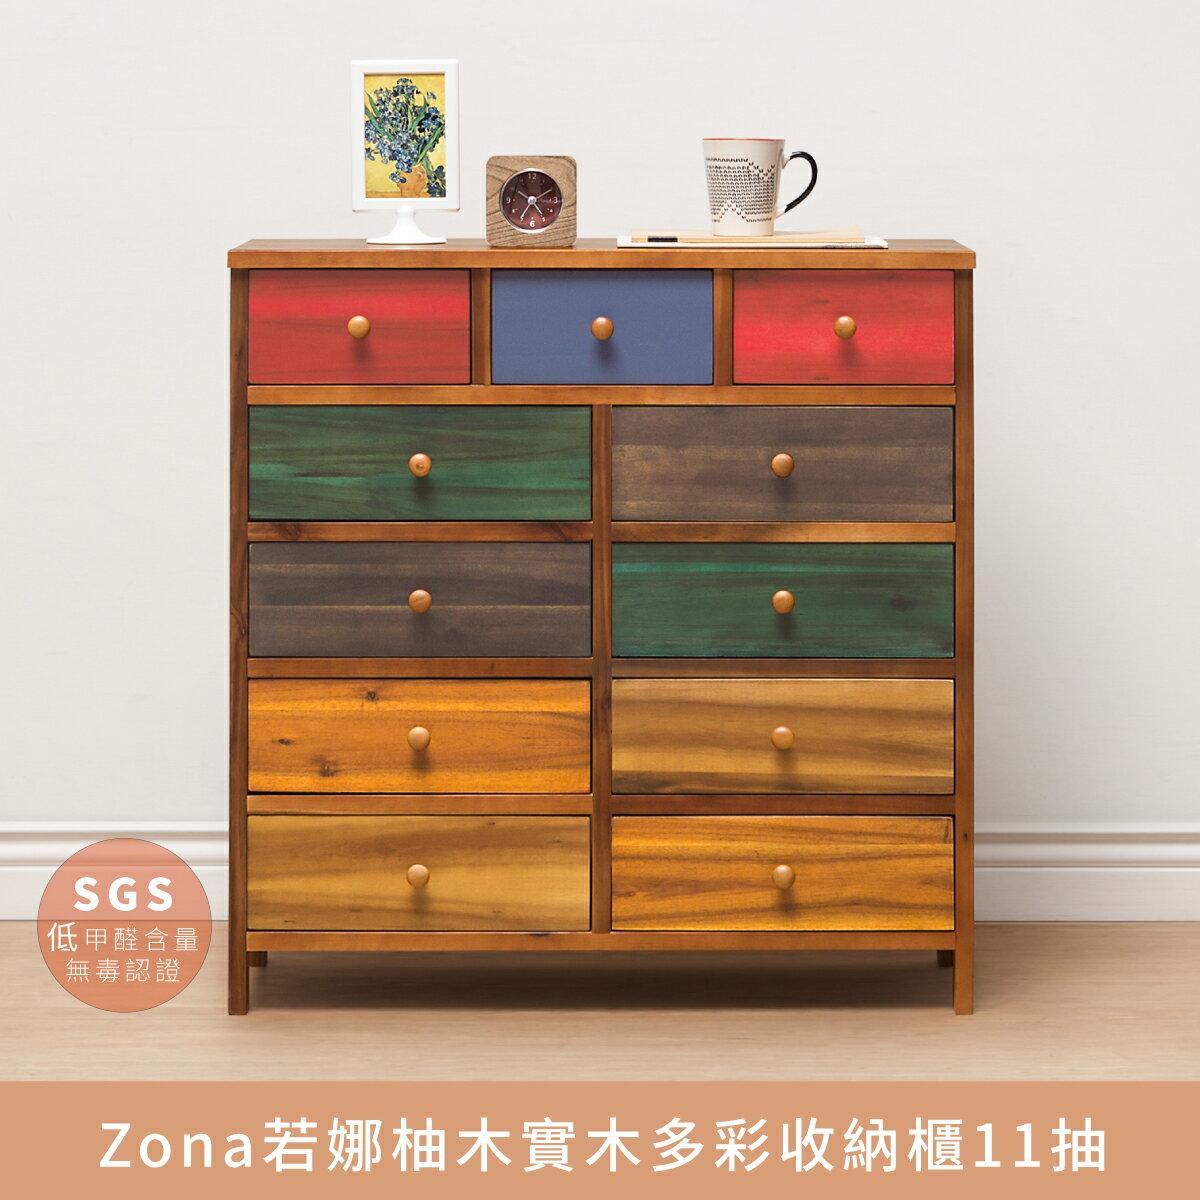 Zona若娜柚木實木多彩收納櫃11抽【myhome8居家無限】 0